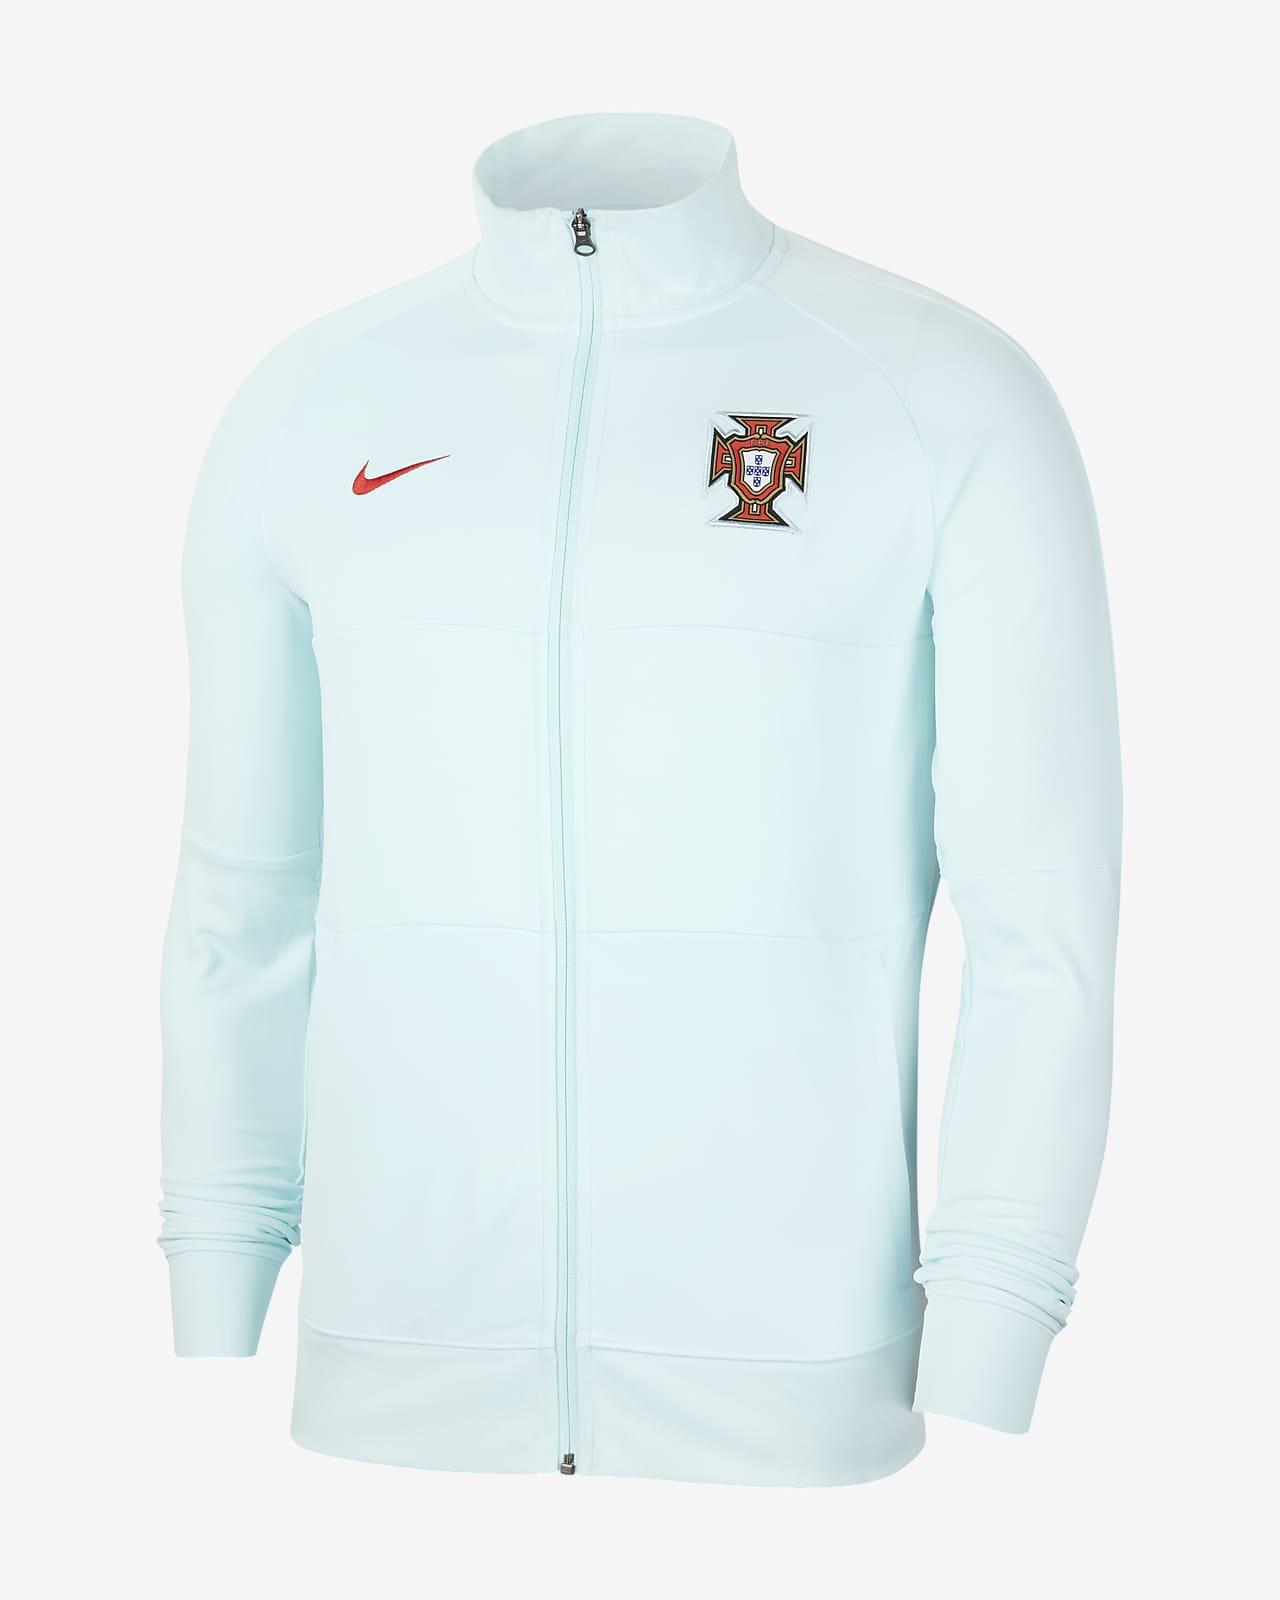 Portugal Men's Football Jacket